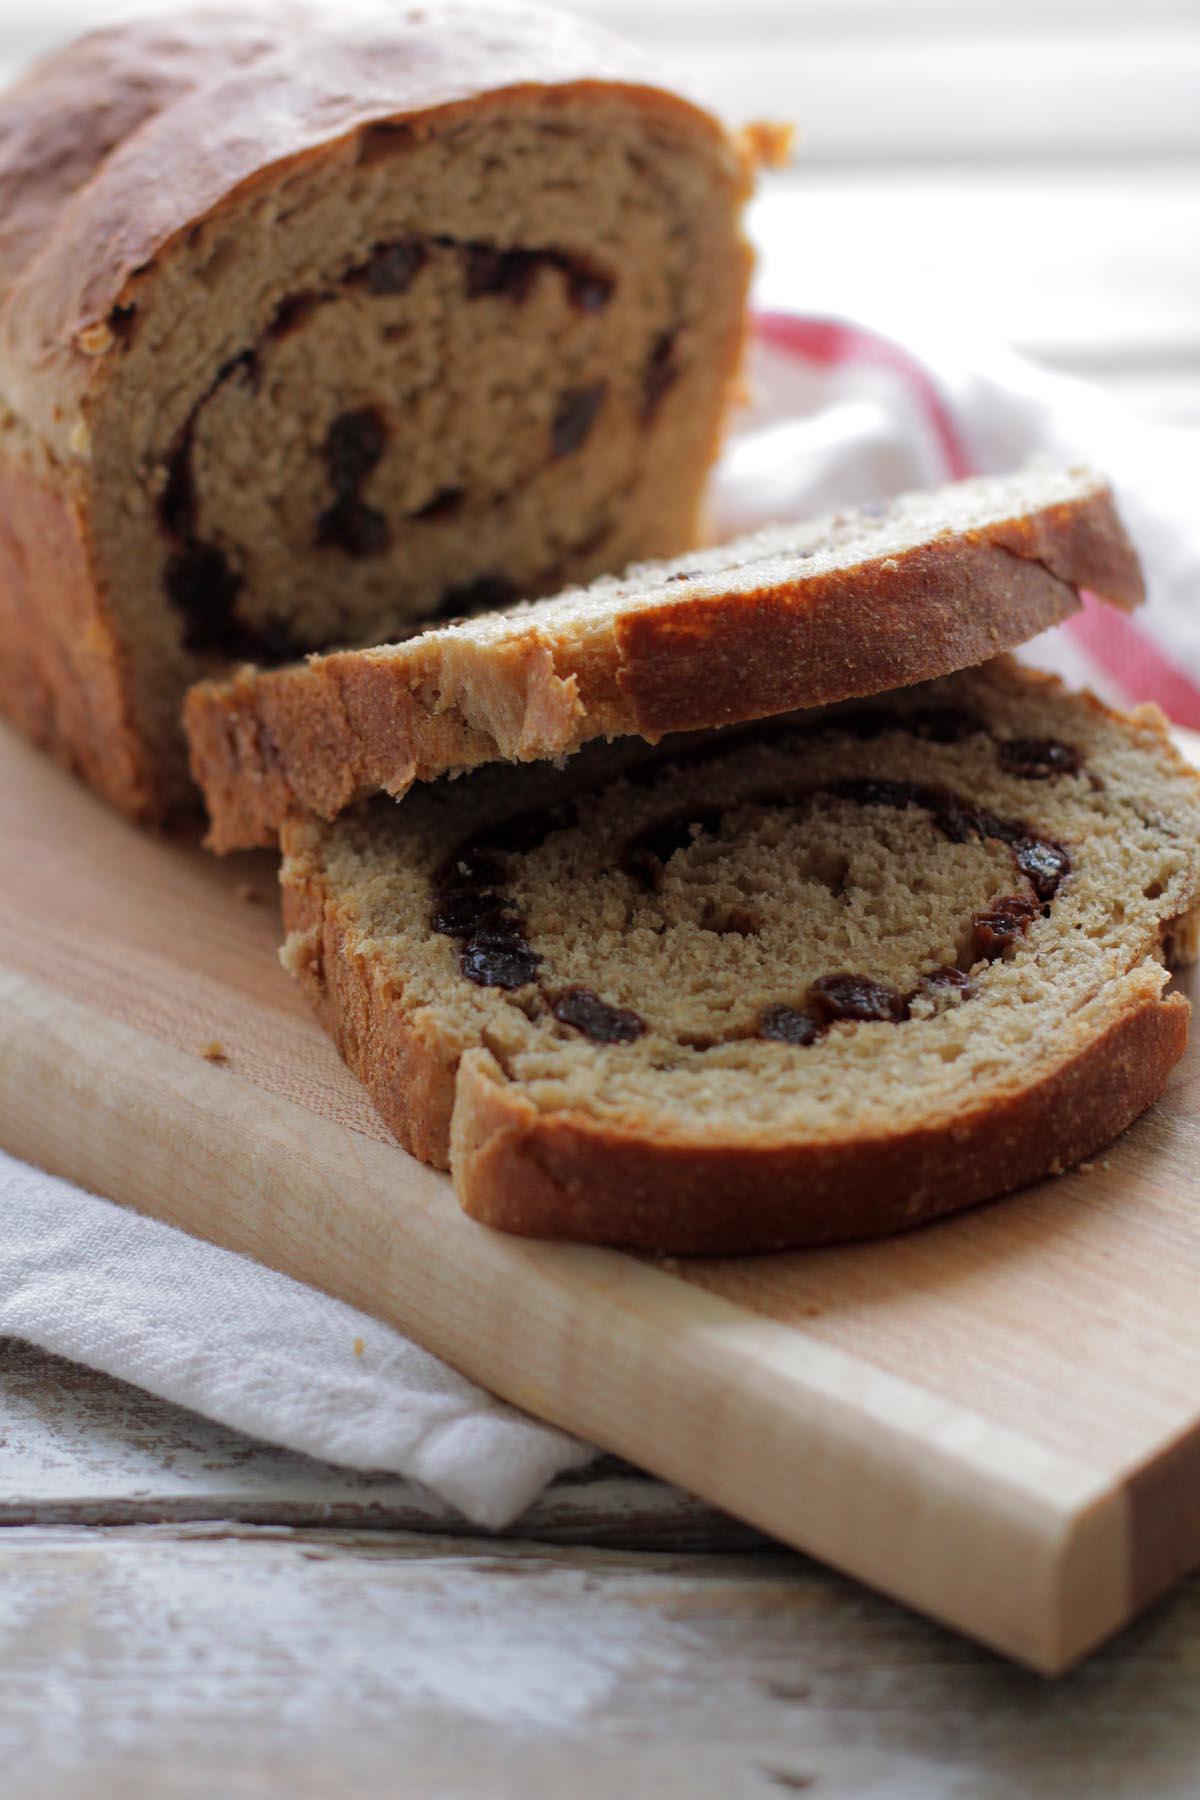 Soaked Whole Wheat Amp Cinnamon Raisin Bread Live Simply